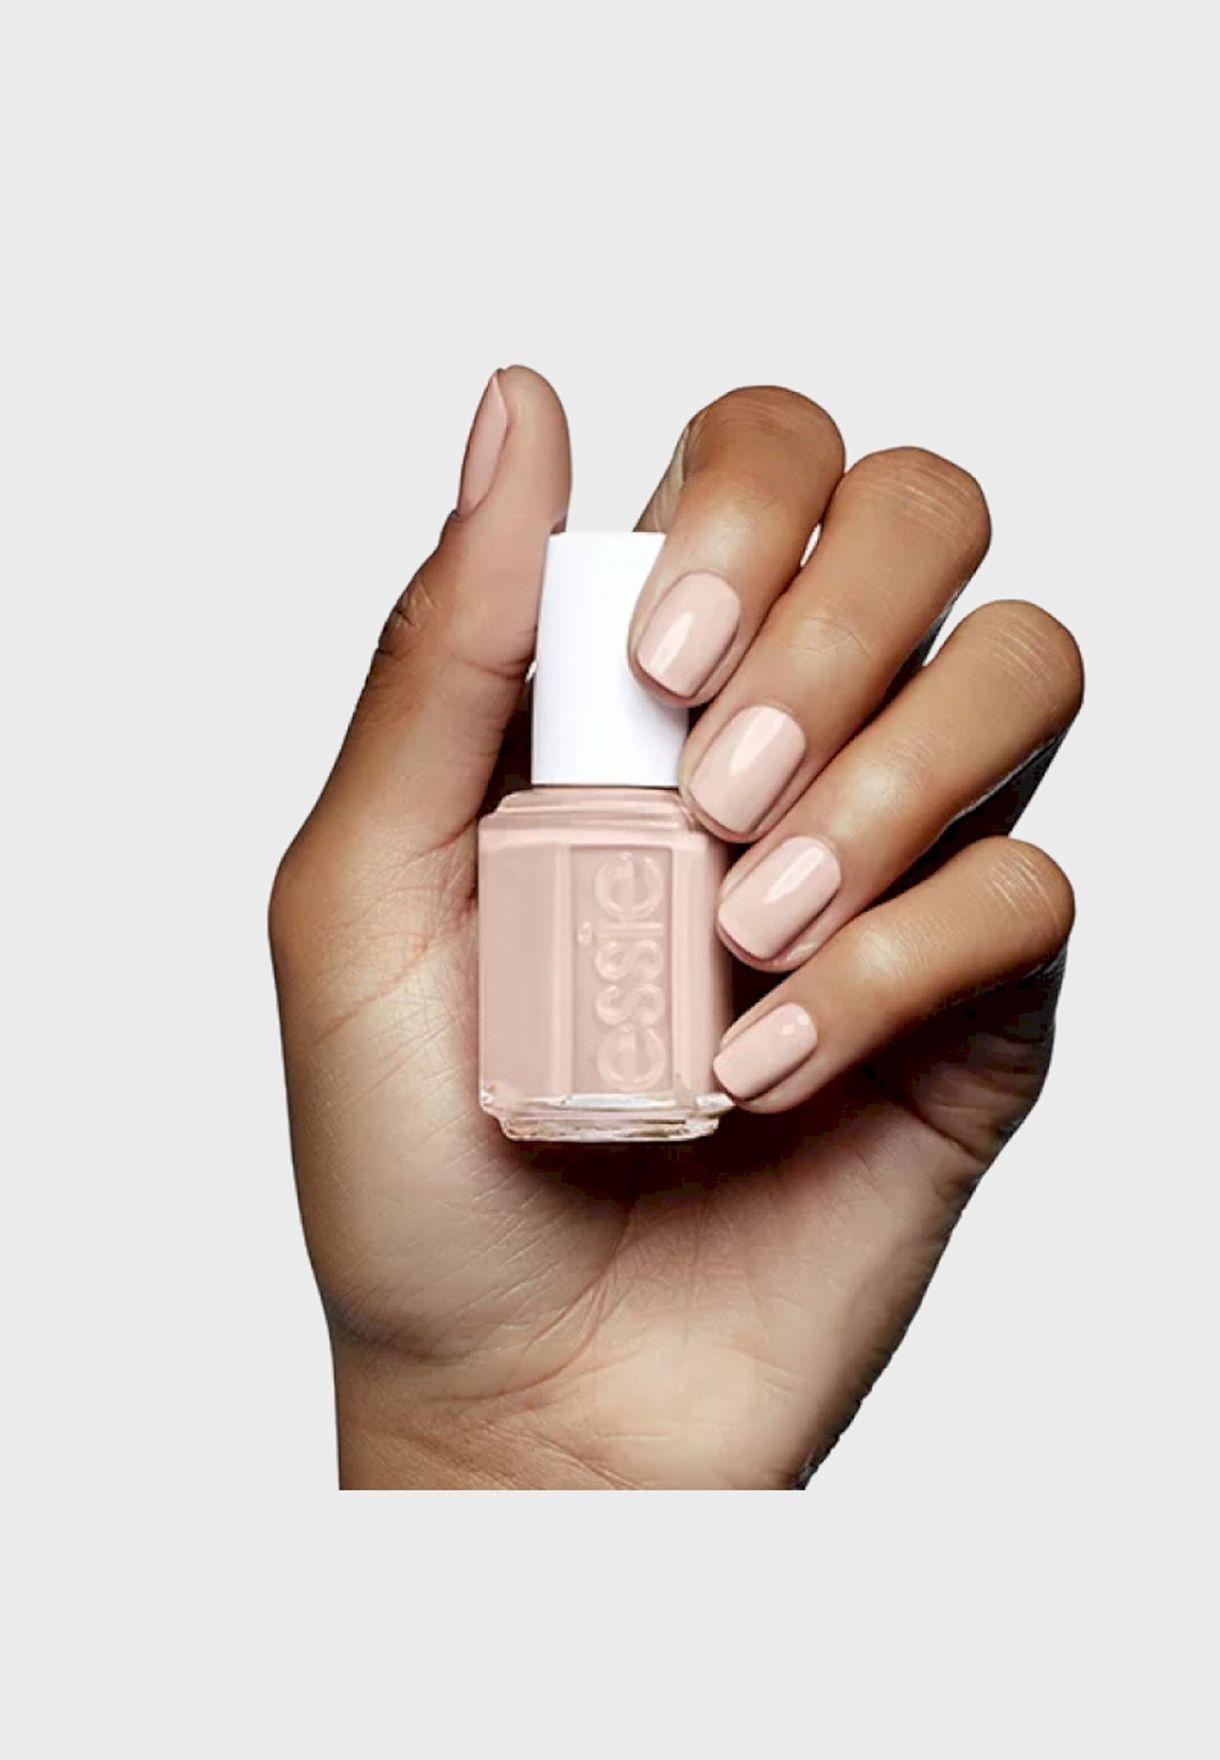 Nail Polish - Not Just A Pretty Face